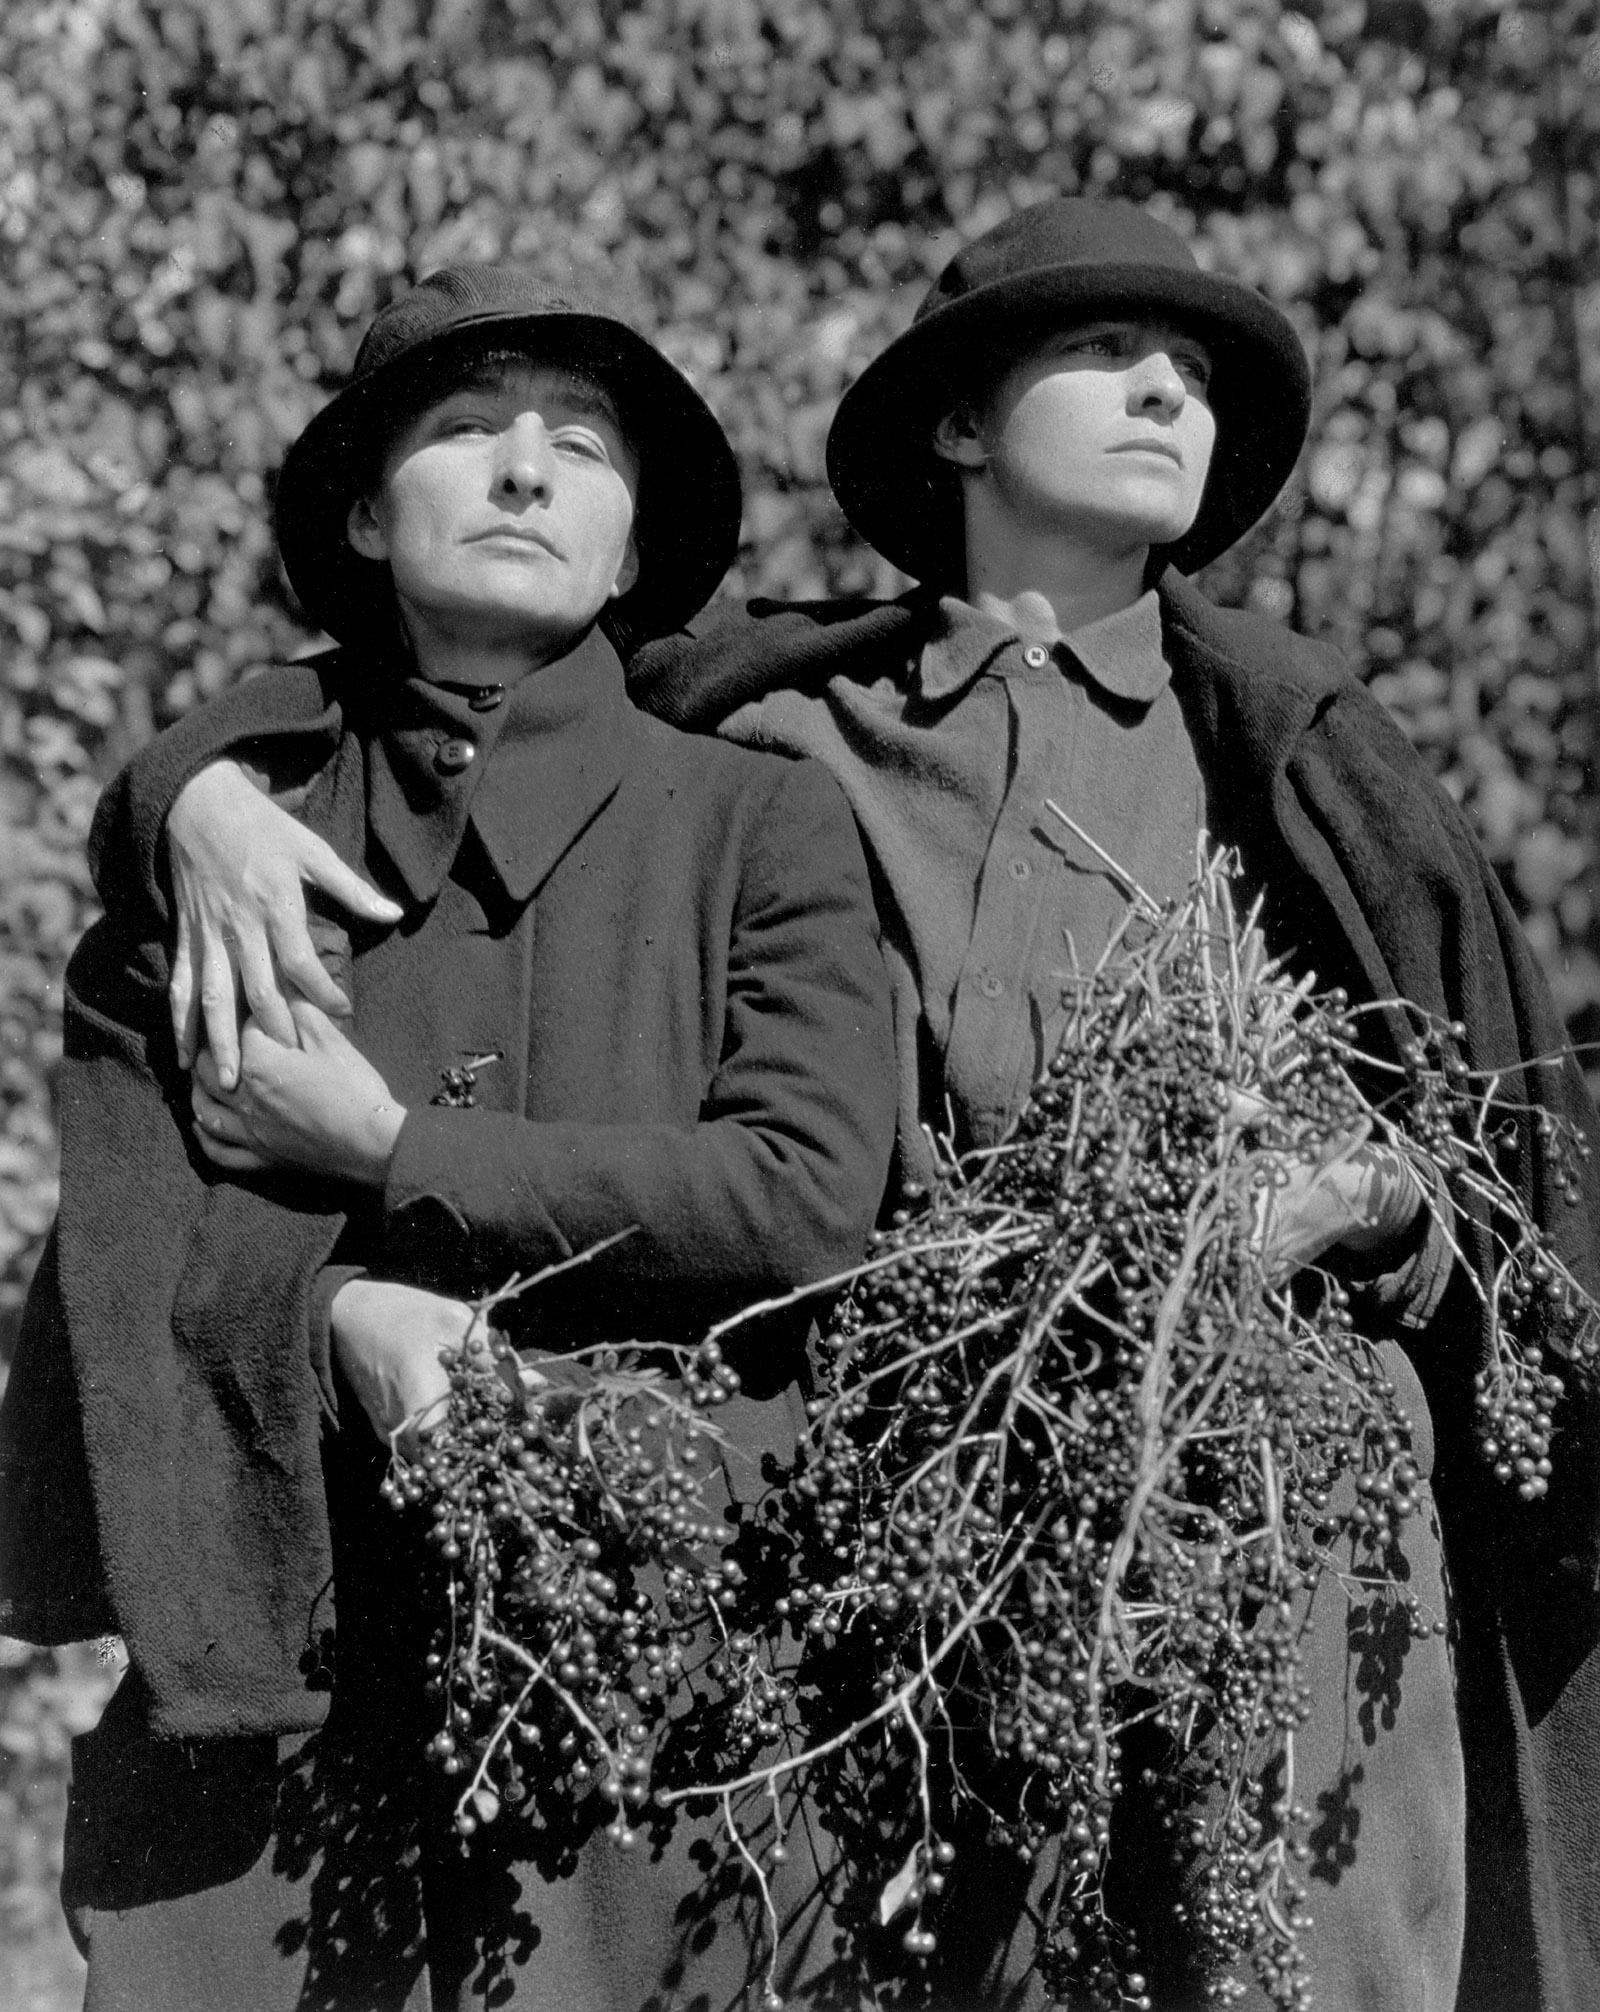 Georgia O'Keeffe and Rebecca Strand, 1922–1923, a photograph by Alfred Stieglitz